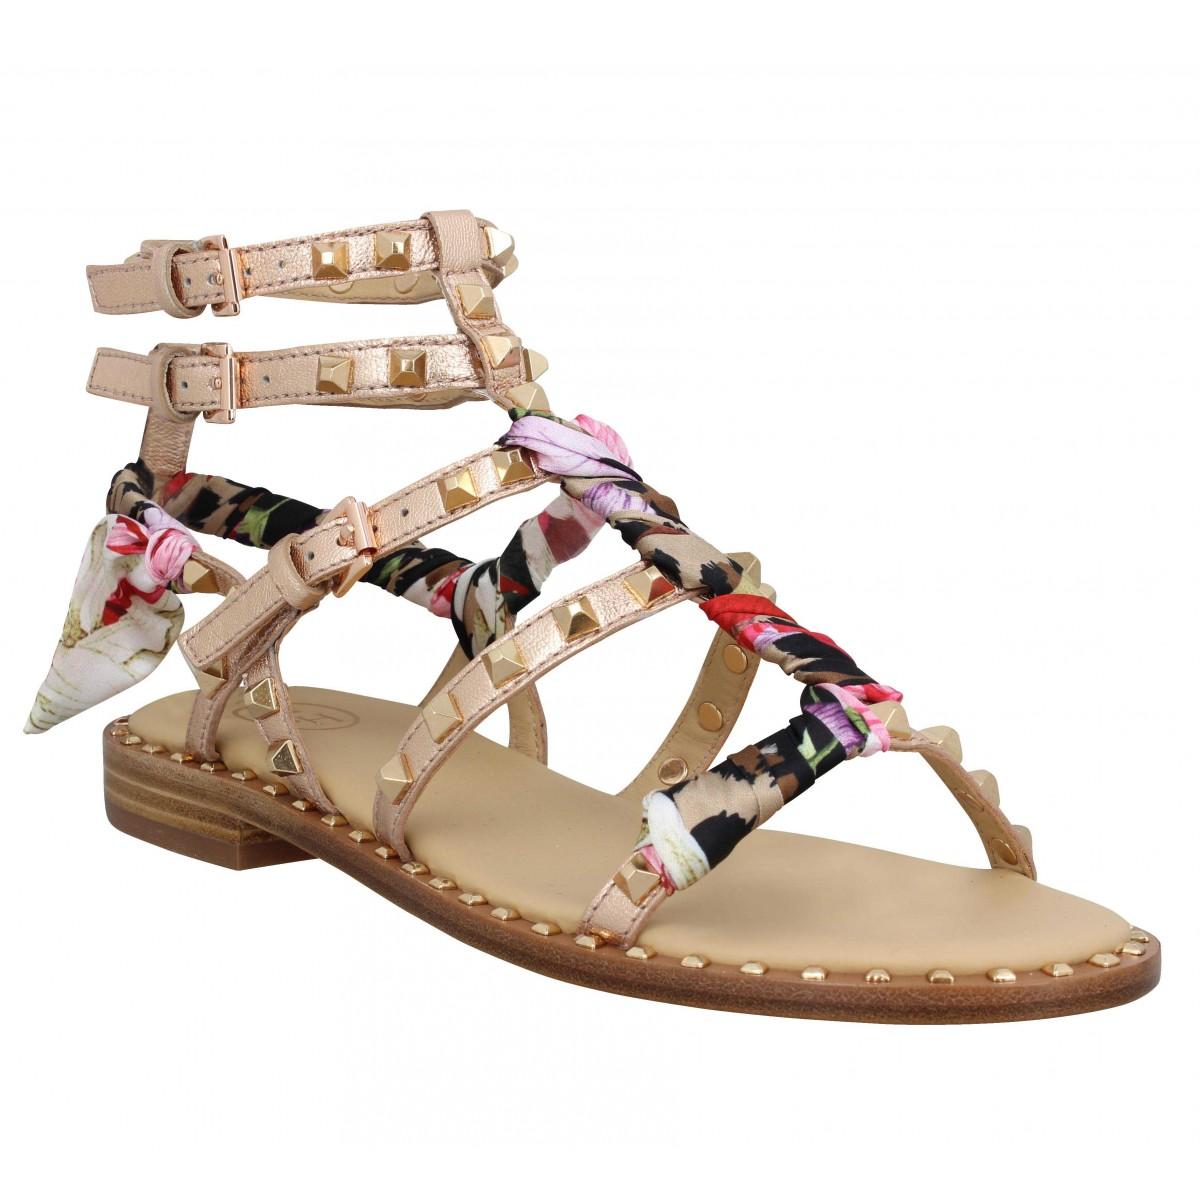 Foulard Cuir Femme Orfanny Chaussures Vgqspzum Pax Ash xdeCBo